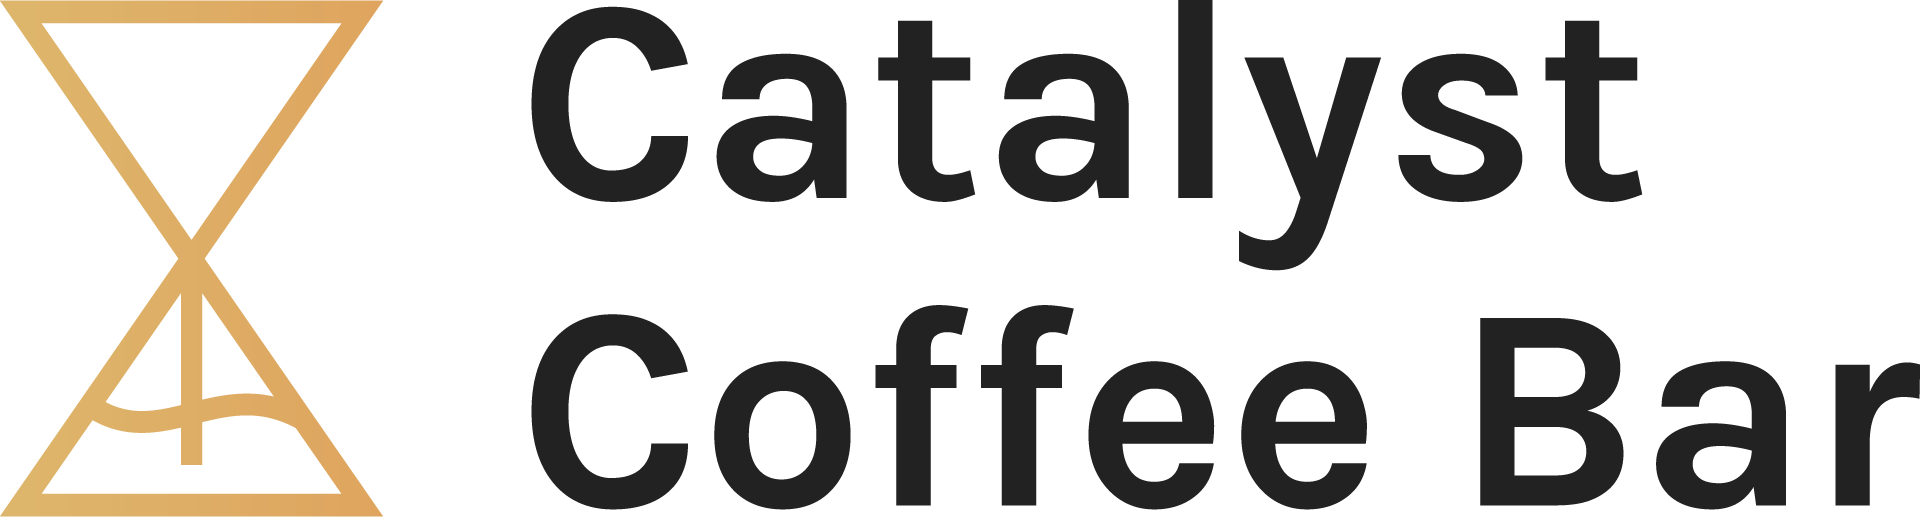 Catalyst Coffee Bar